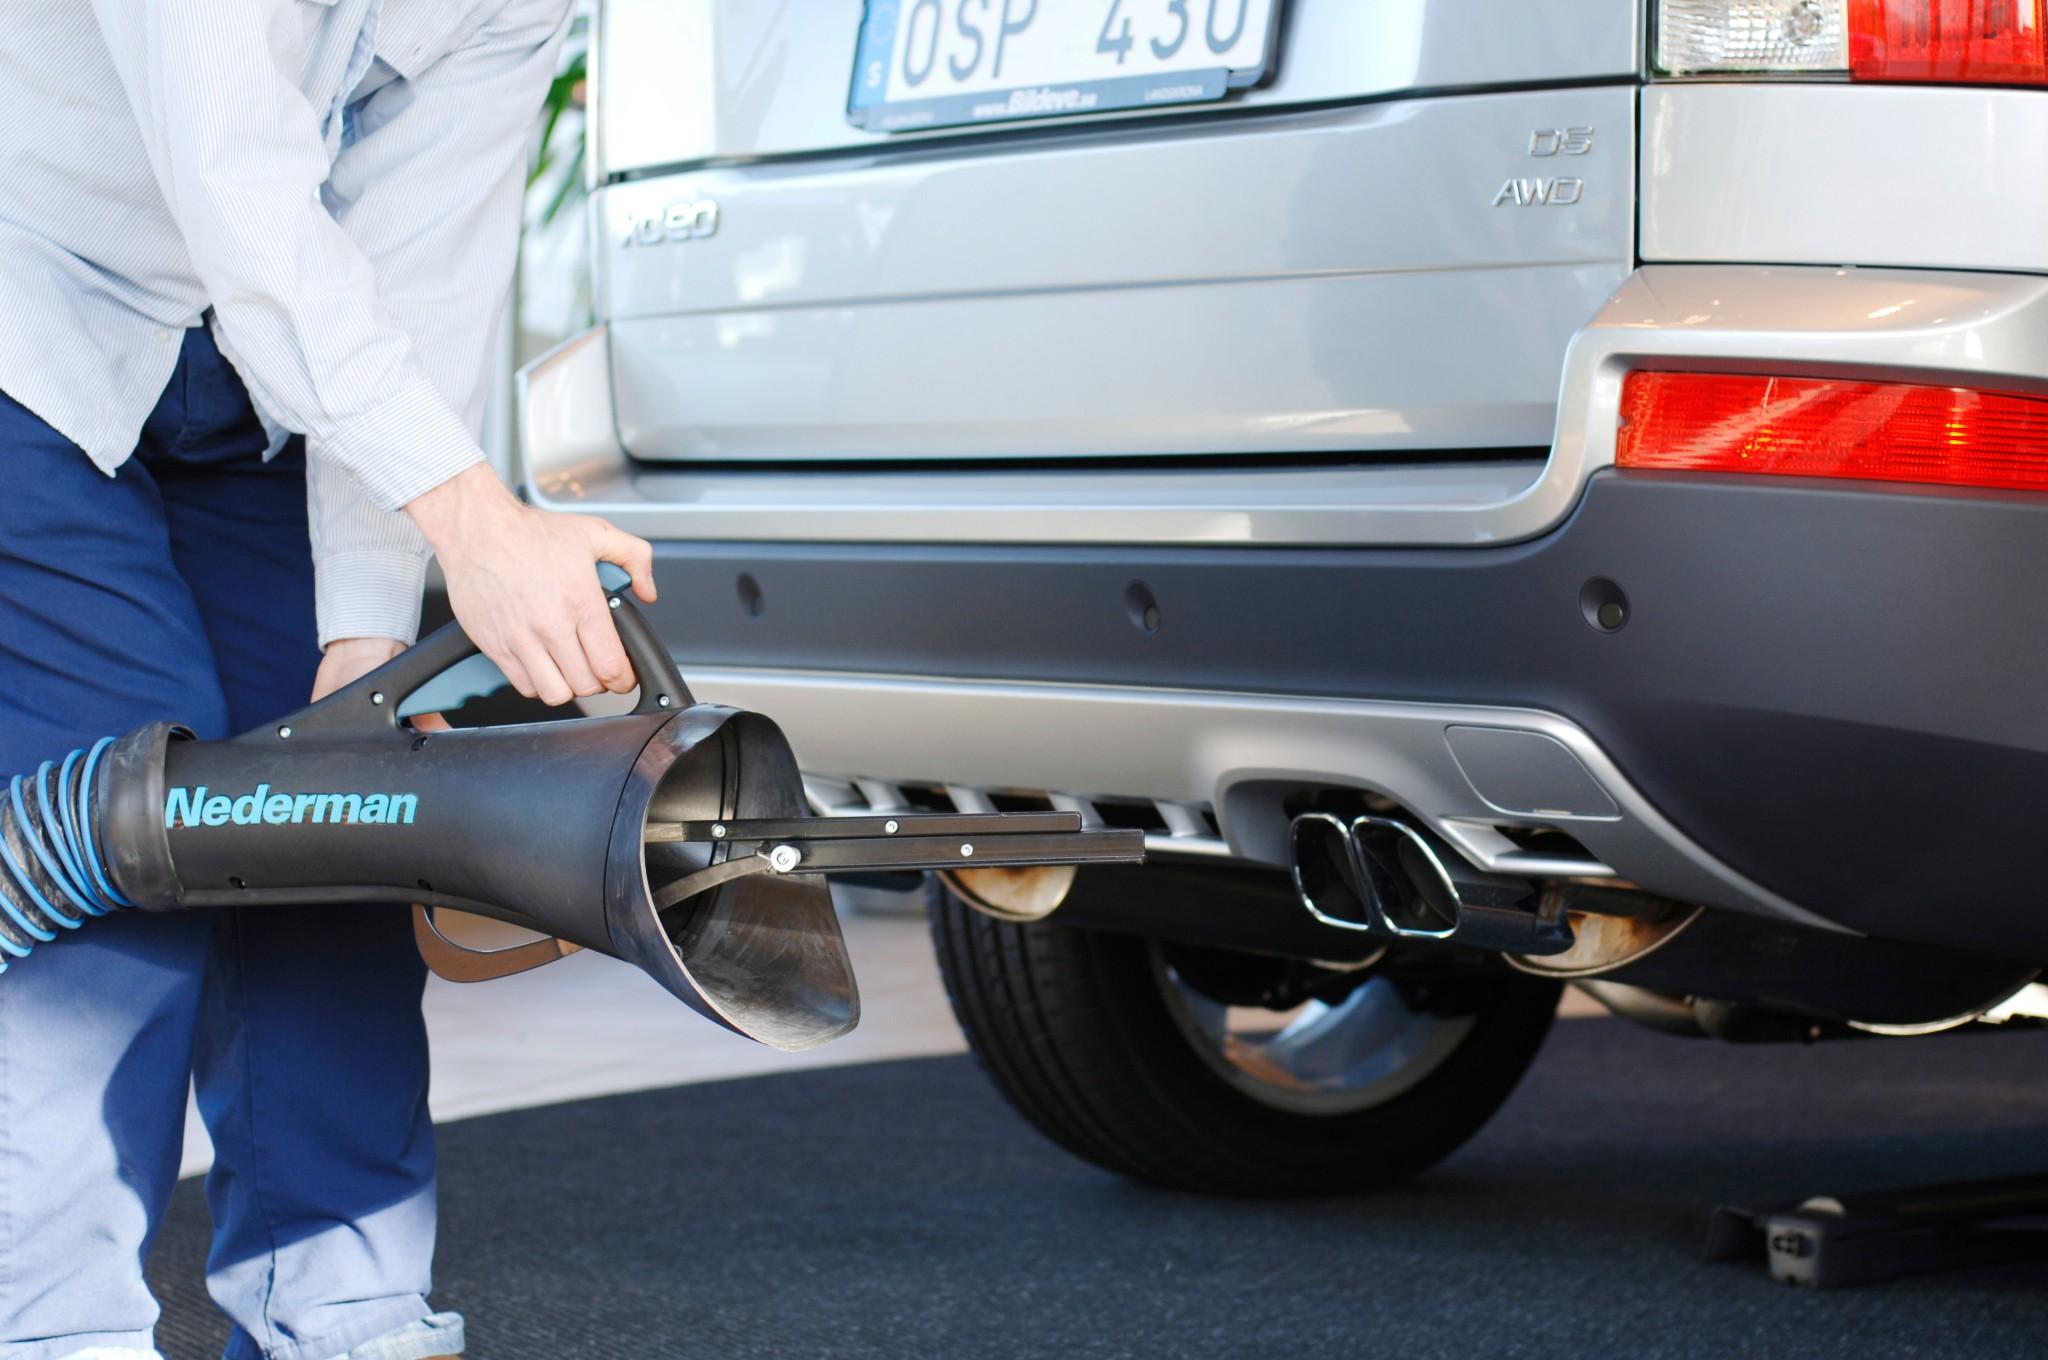 universal-exhaust-nozzle_23339359302_o.jpg